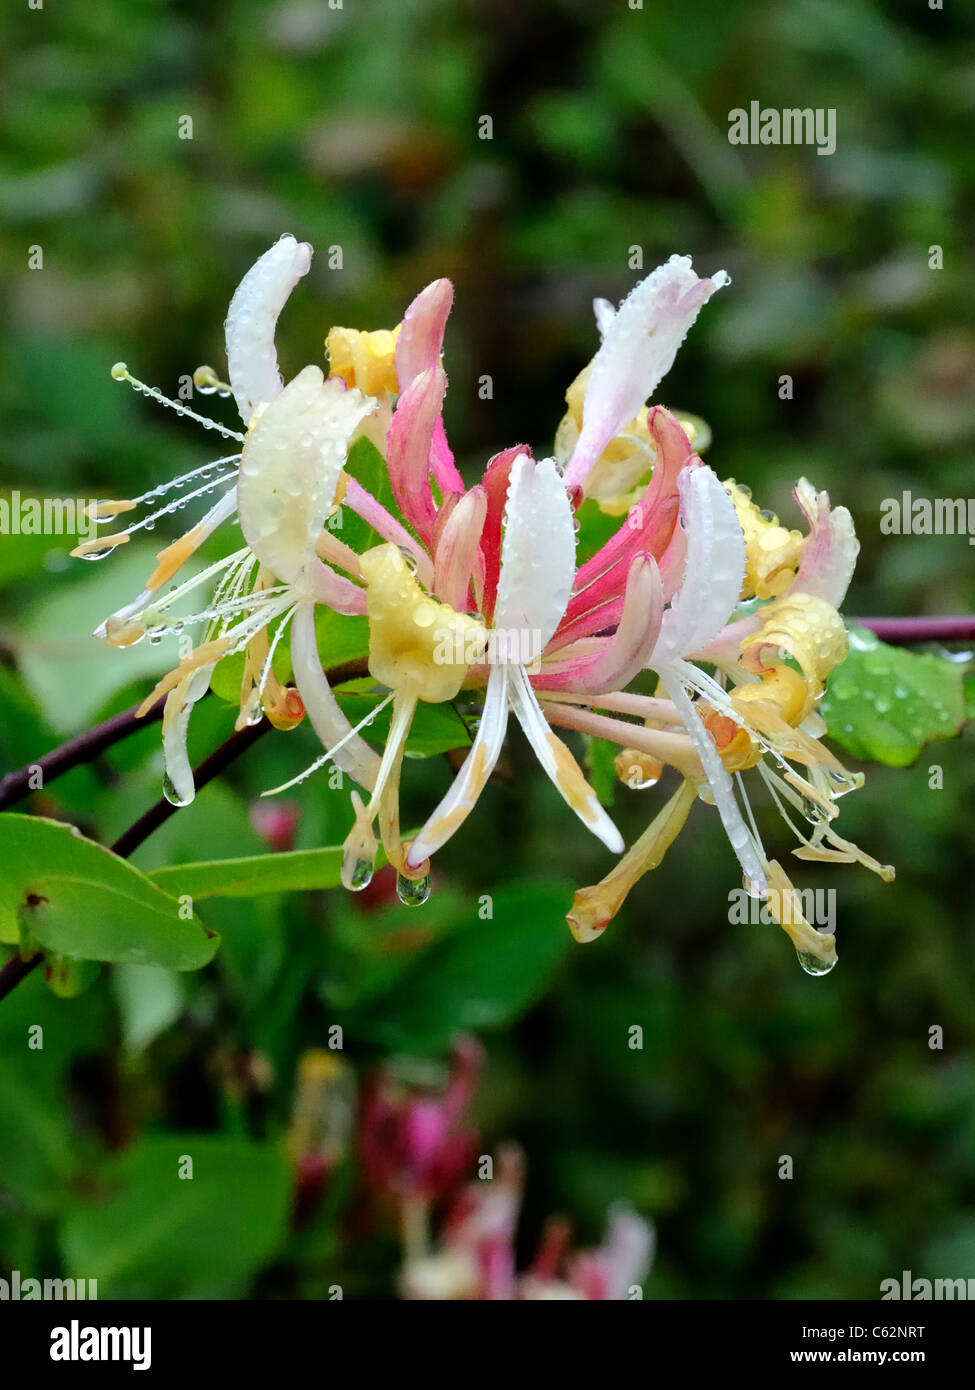 European Honeysuckle, Lonicera periclymenum, flower in allotment - Stock Image